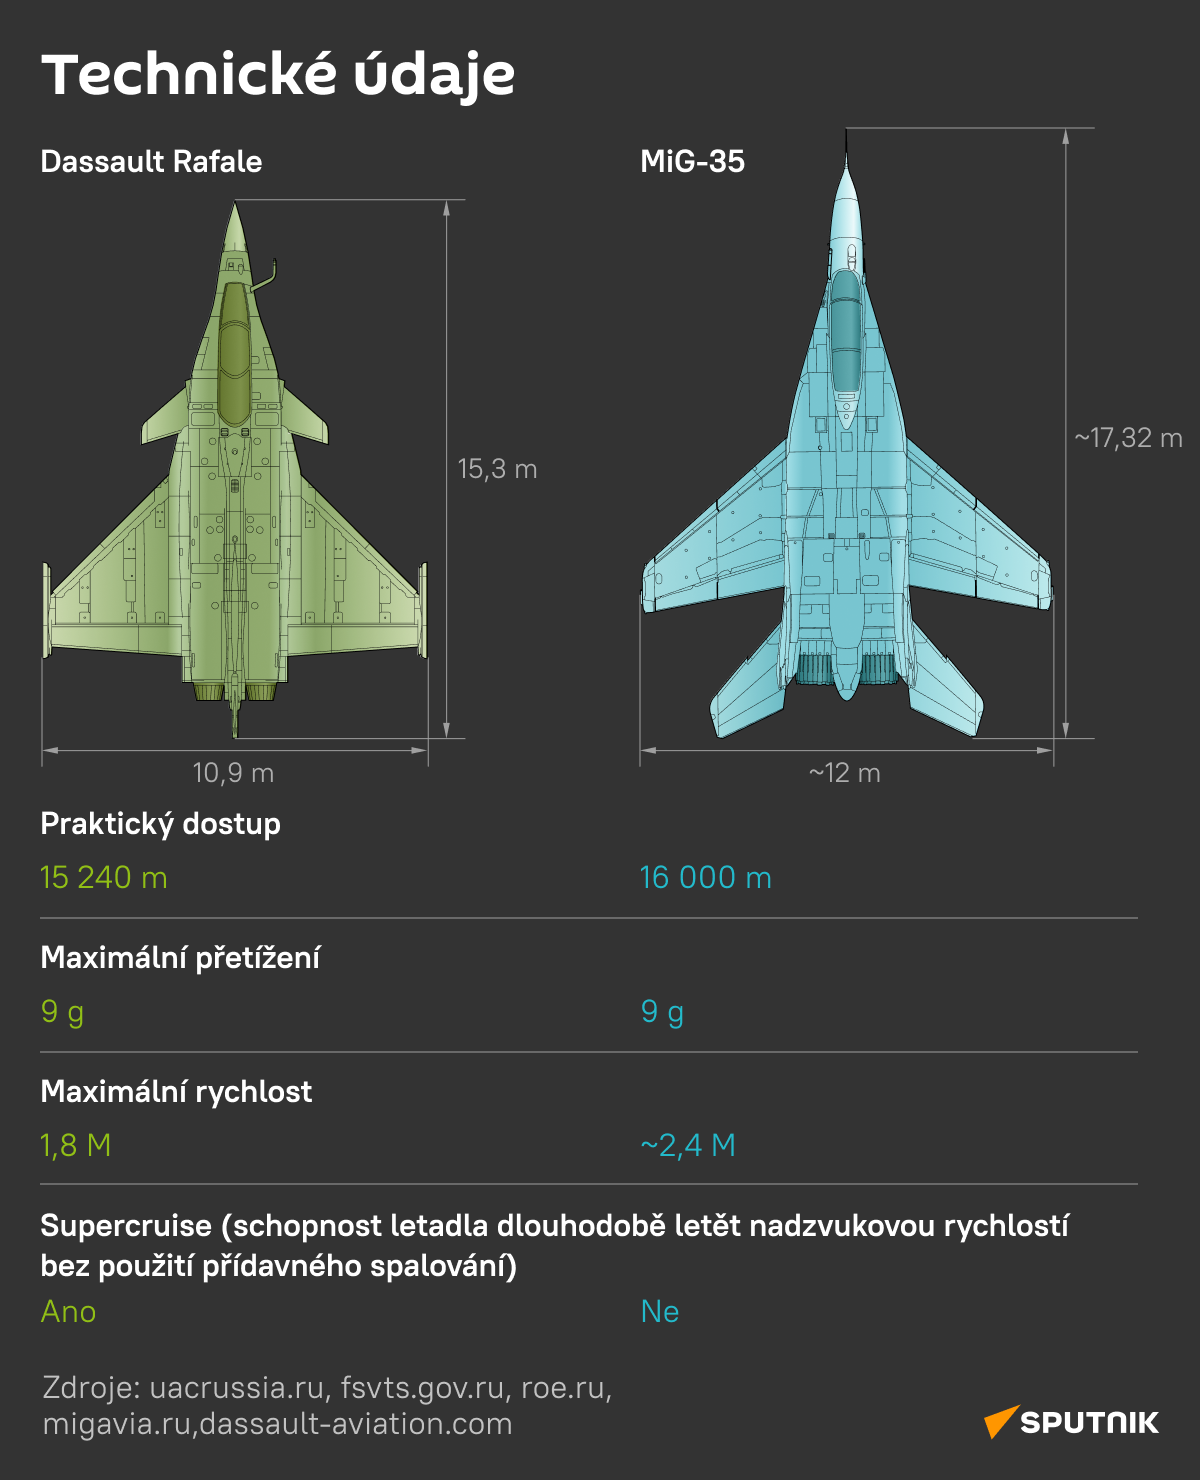 Dassault Rafale versus MiG-35: Technické údaje - Sputnik Česká republika